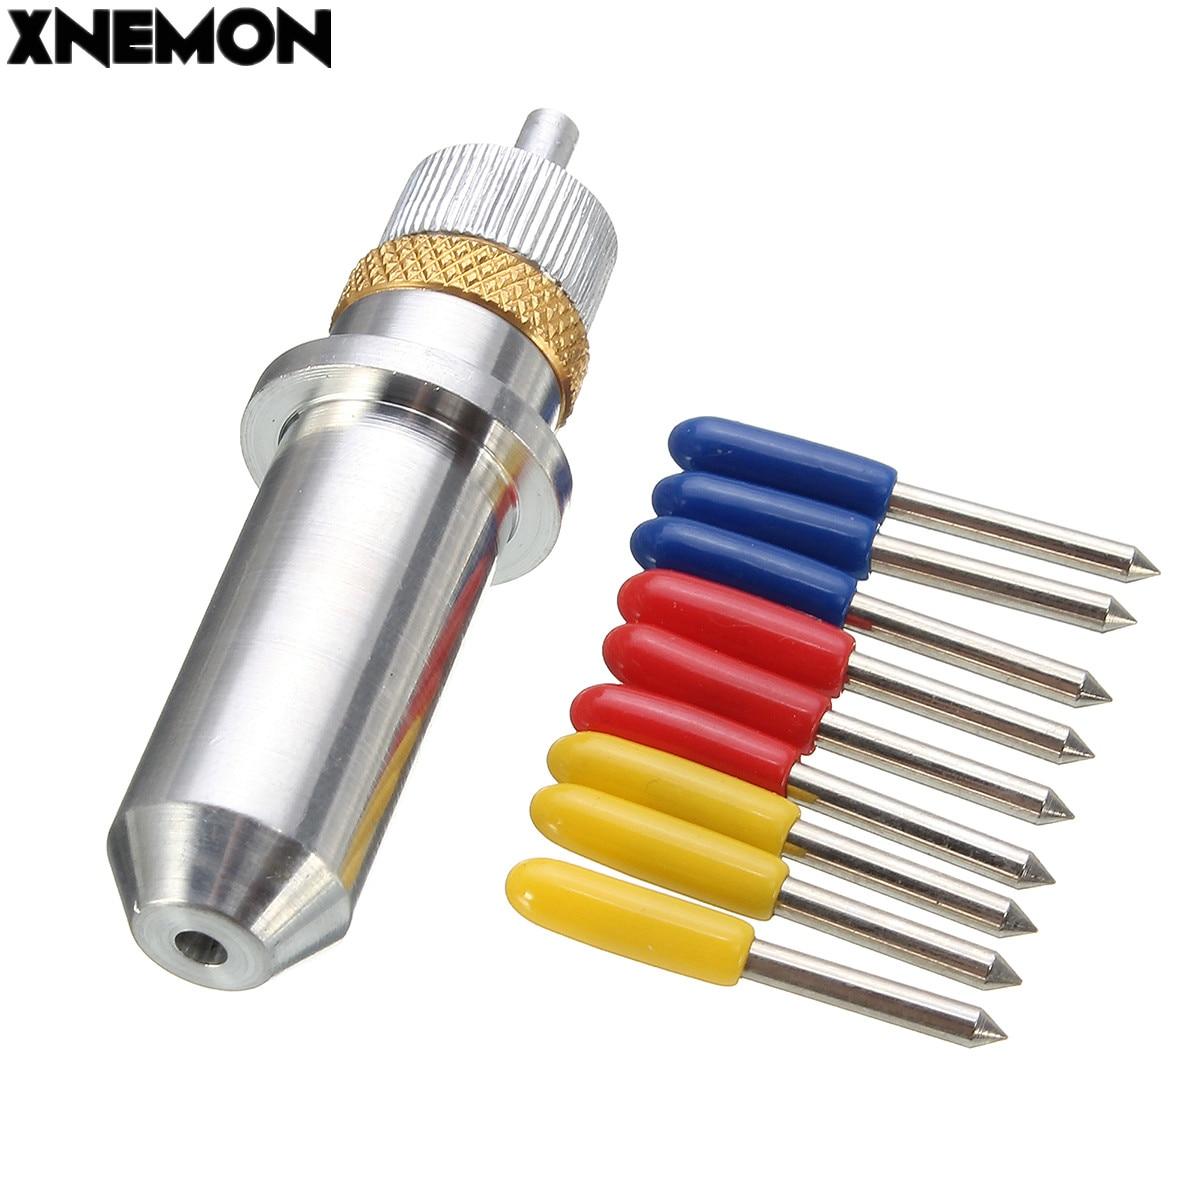 Xnemon 9pcs Set 30 45 60 Degree Roland Cutting Plotter